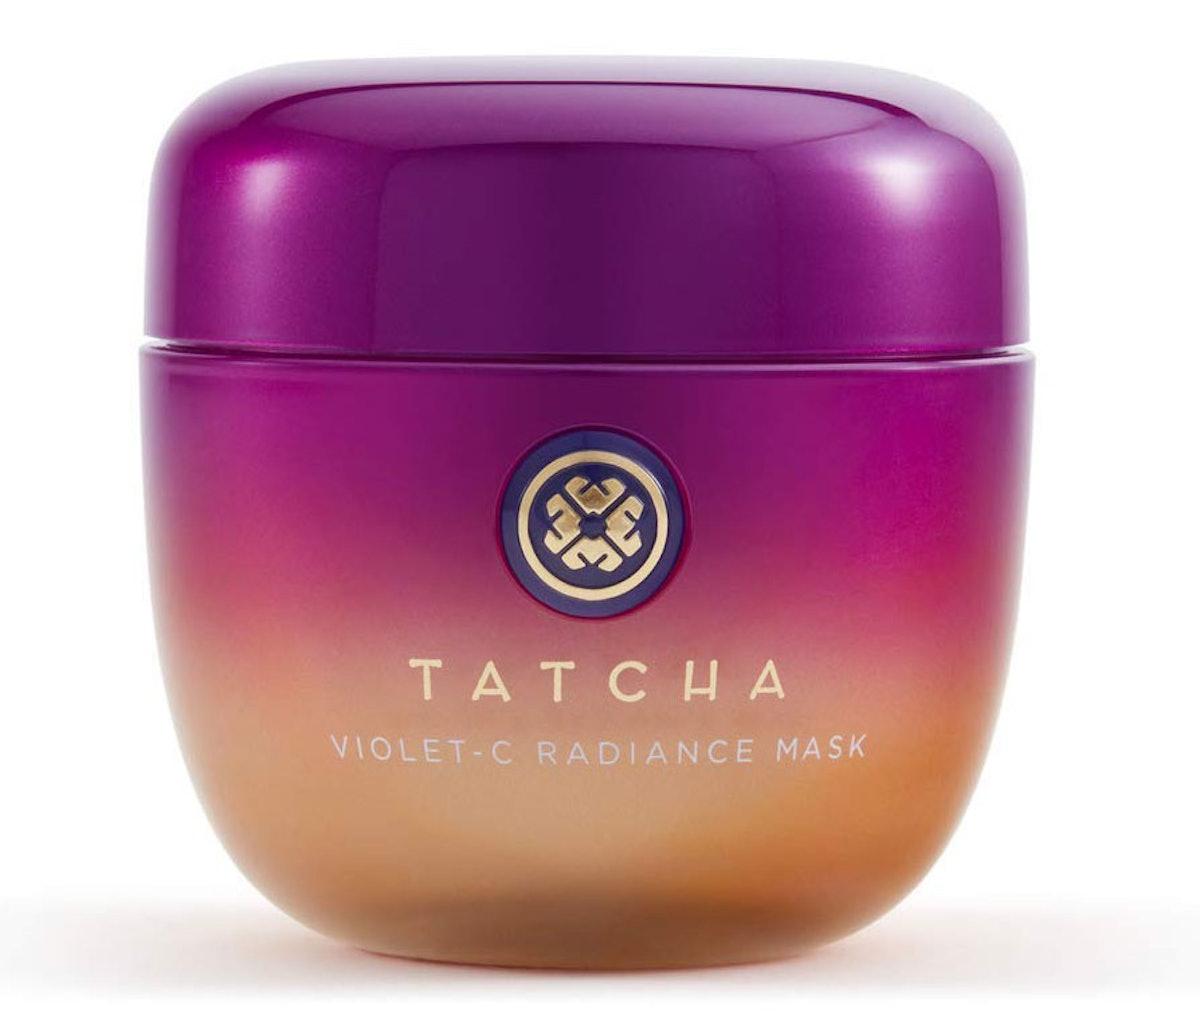 Tatcha The Violet-C Radiance Mask